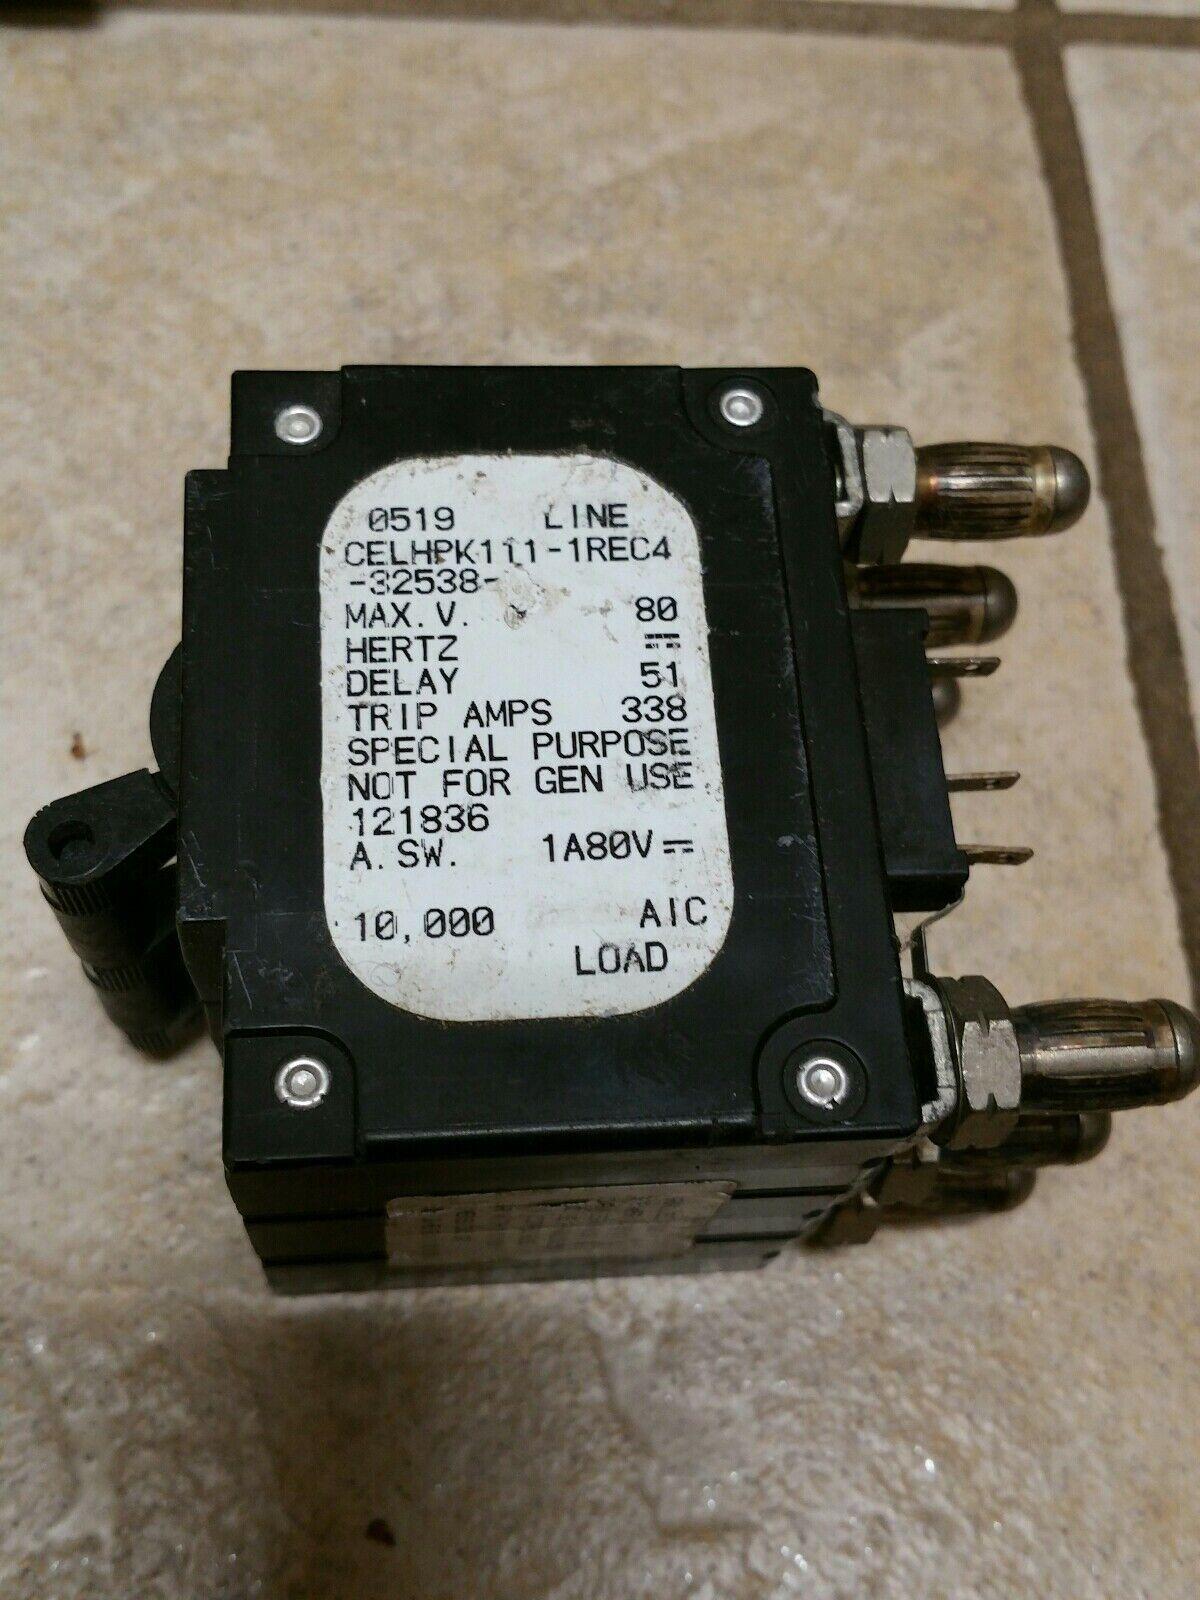 AIRPAX 250 AMP BULLET BREAKER CELHPK111-1REC4-32538-1 ~